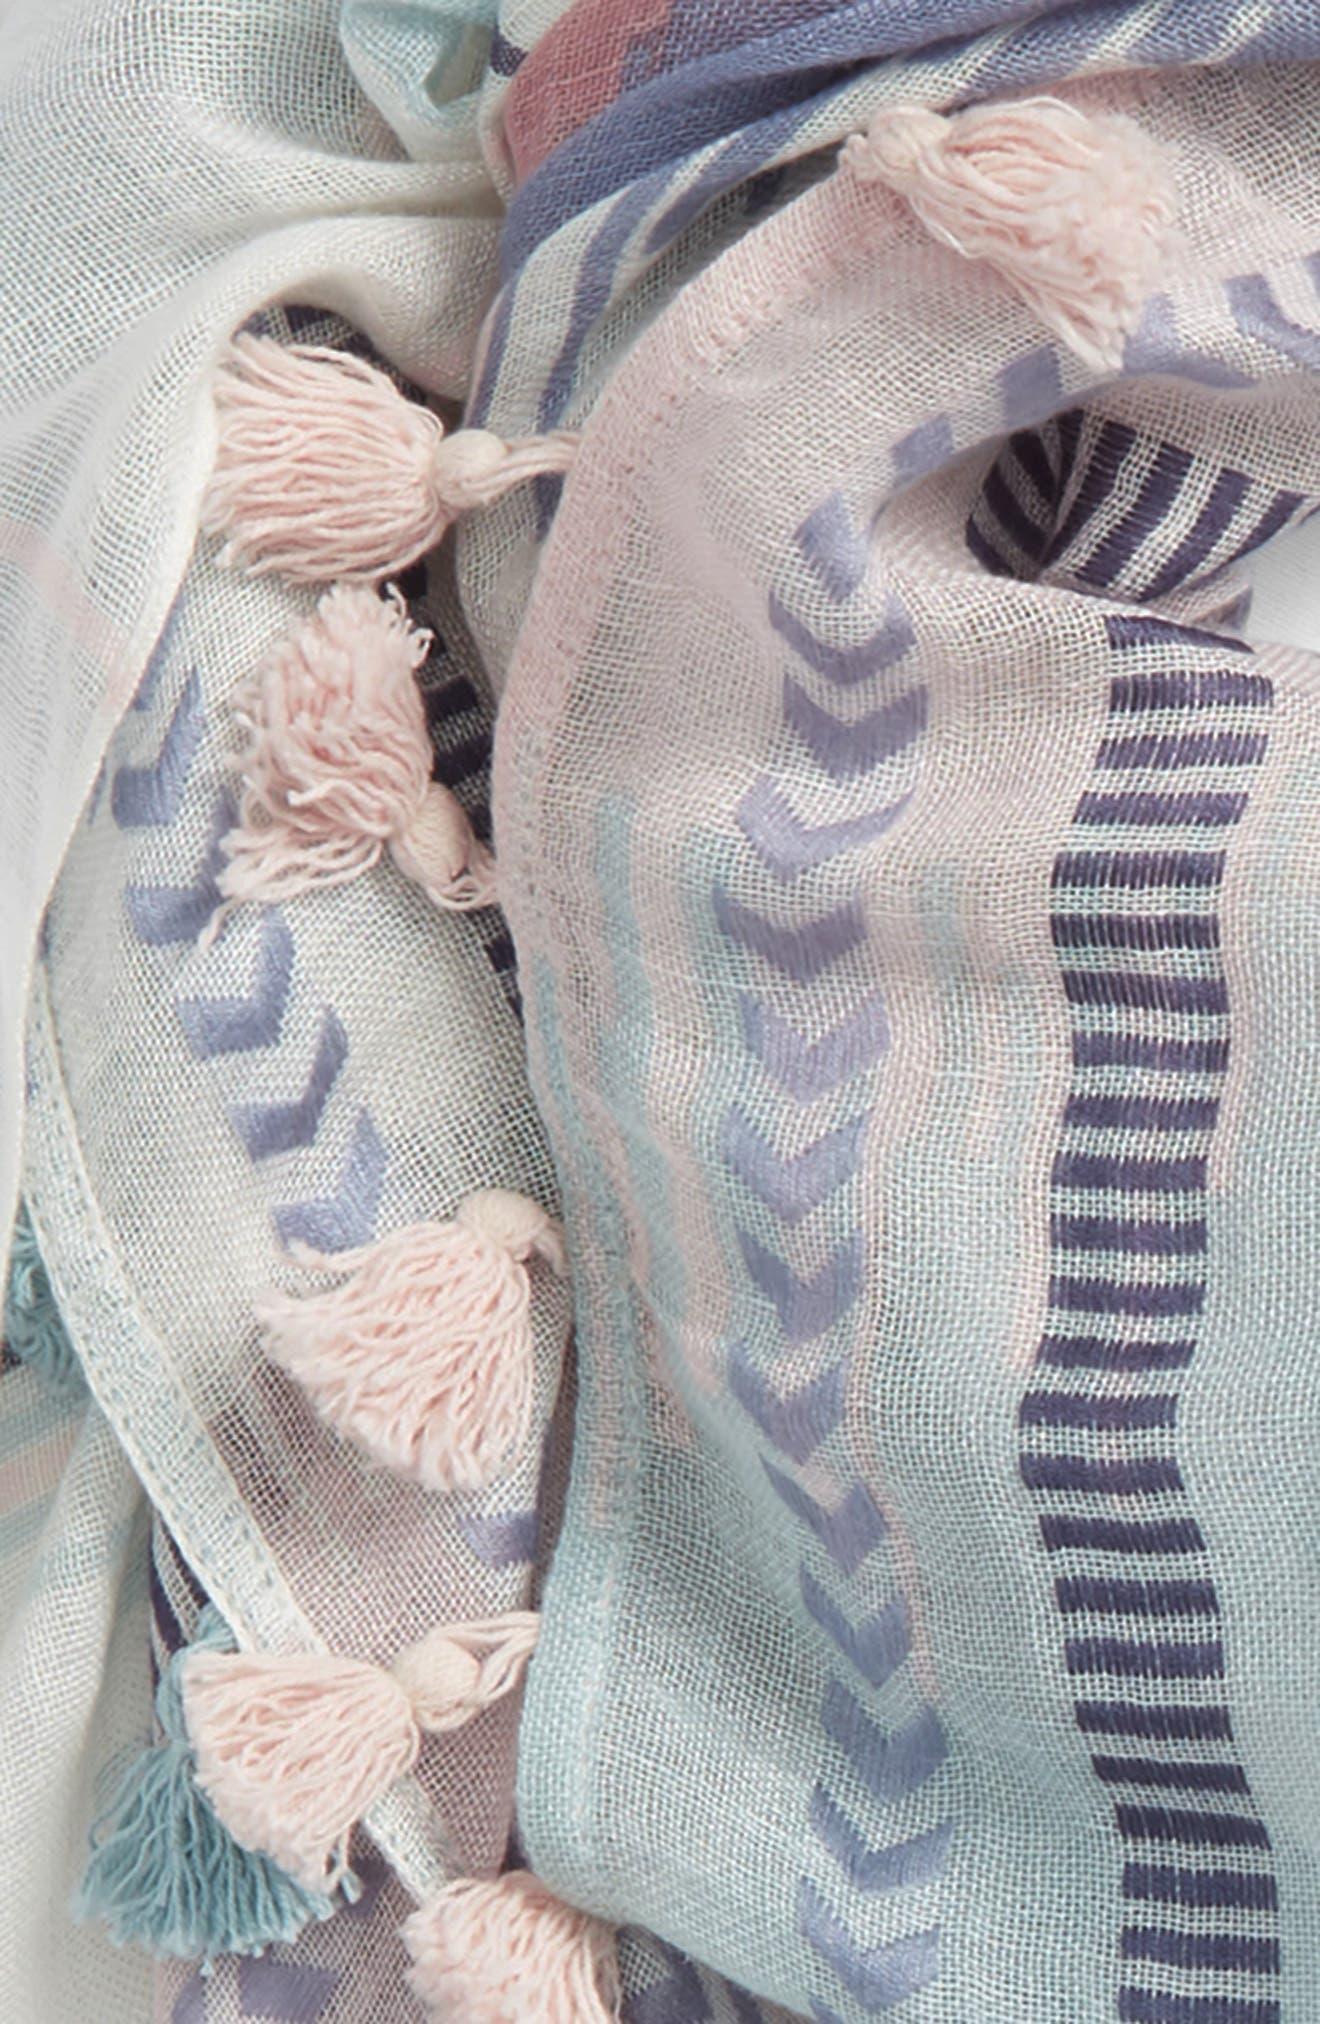 Caslon Ikat Stripe Linen Blend Scarf,                             Alternate thumbnail 3, color,                             Pink Printed Ikat